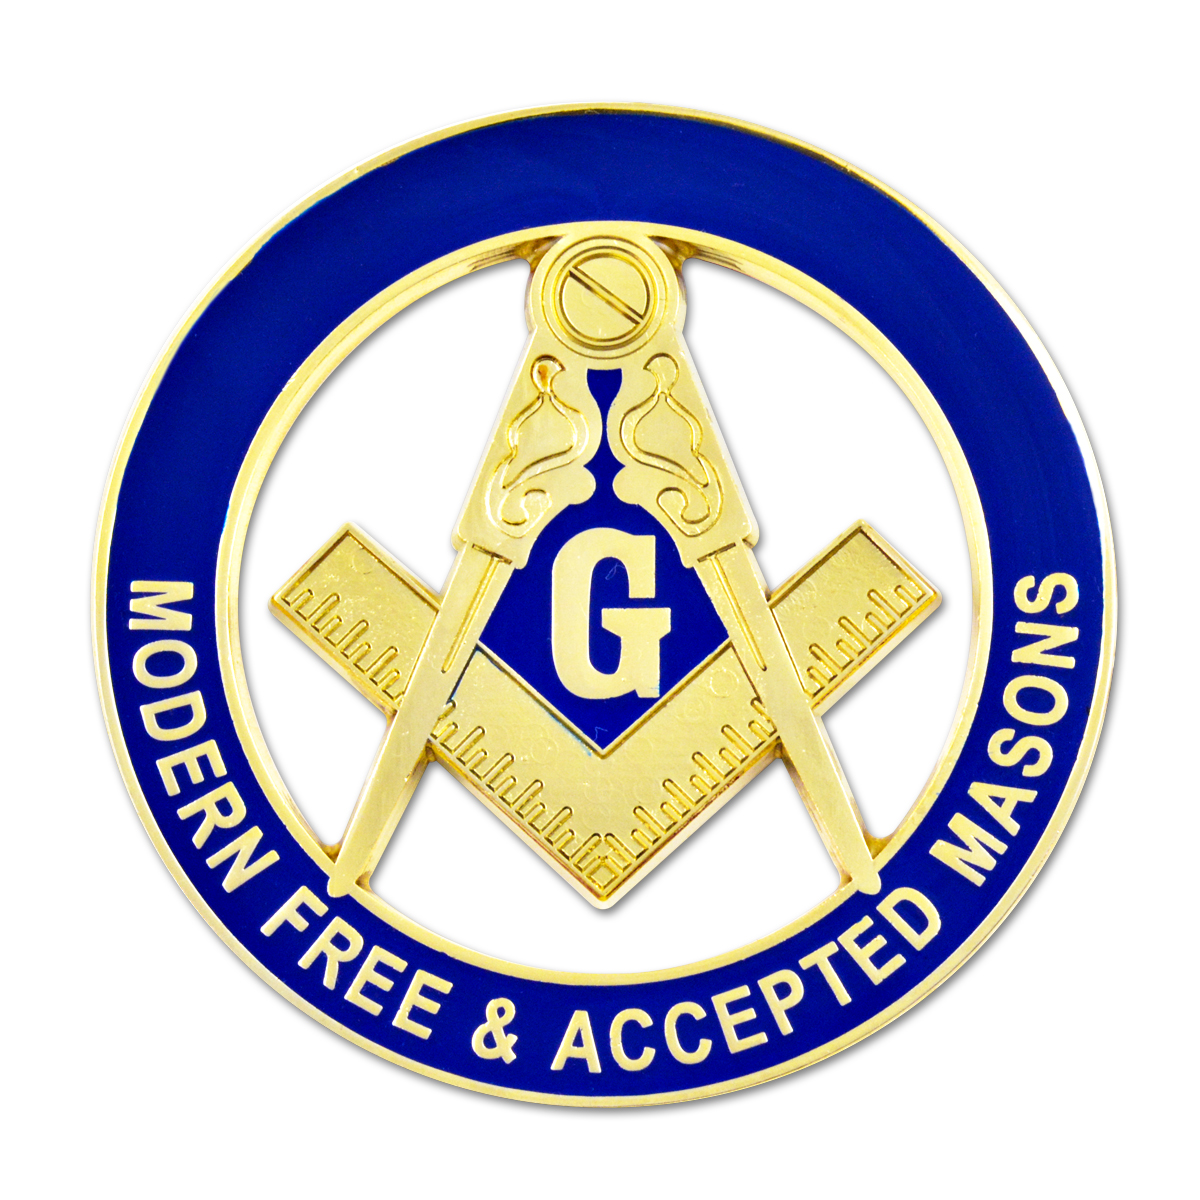 3 Diameter Square /& Compass Sun Round Masonic Auto Emblem Red White Blue